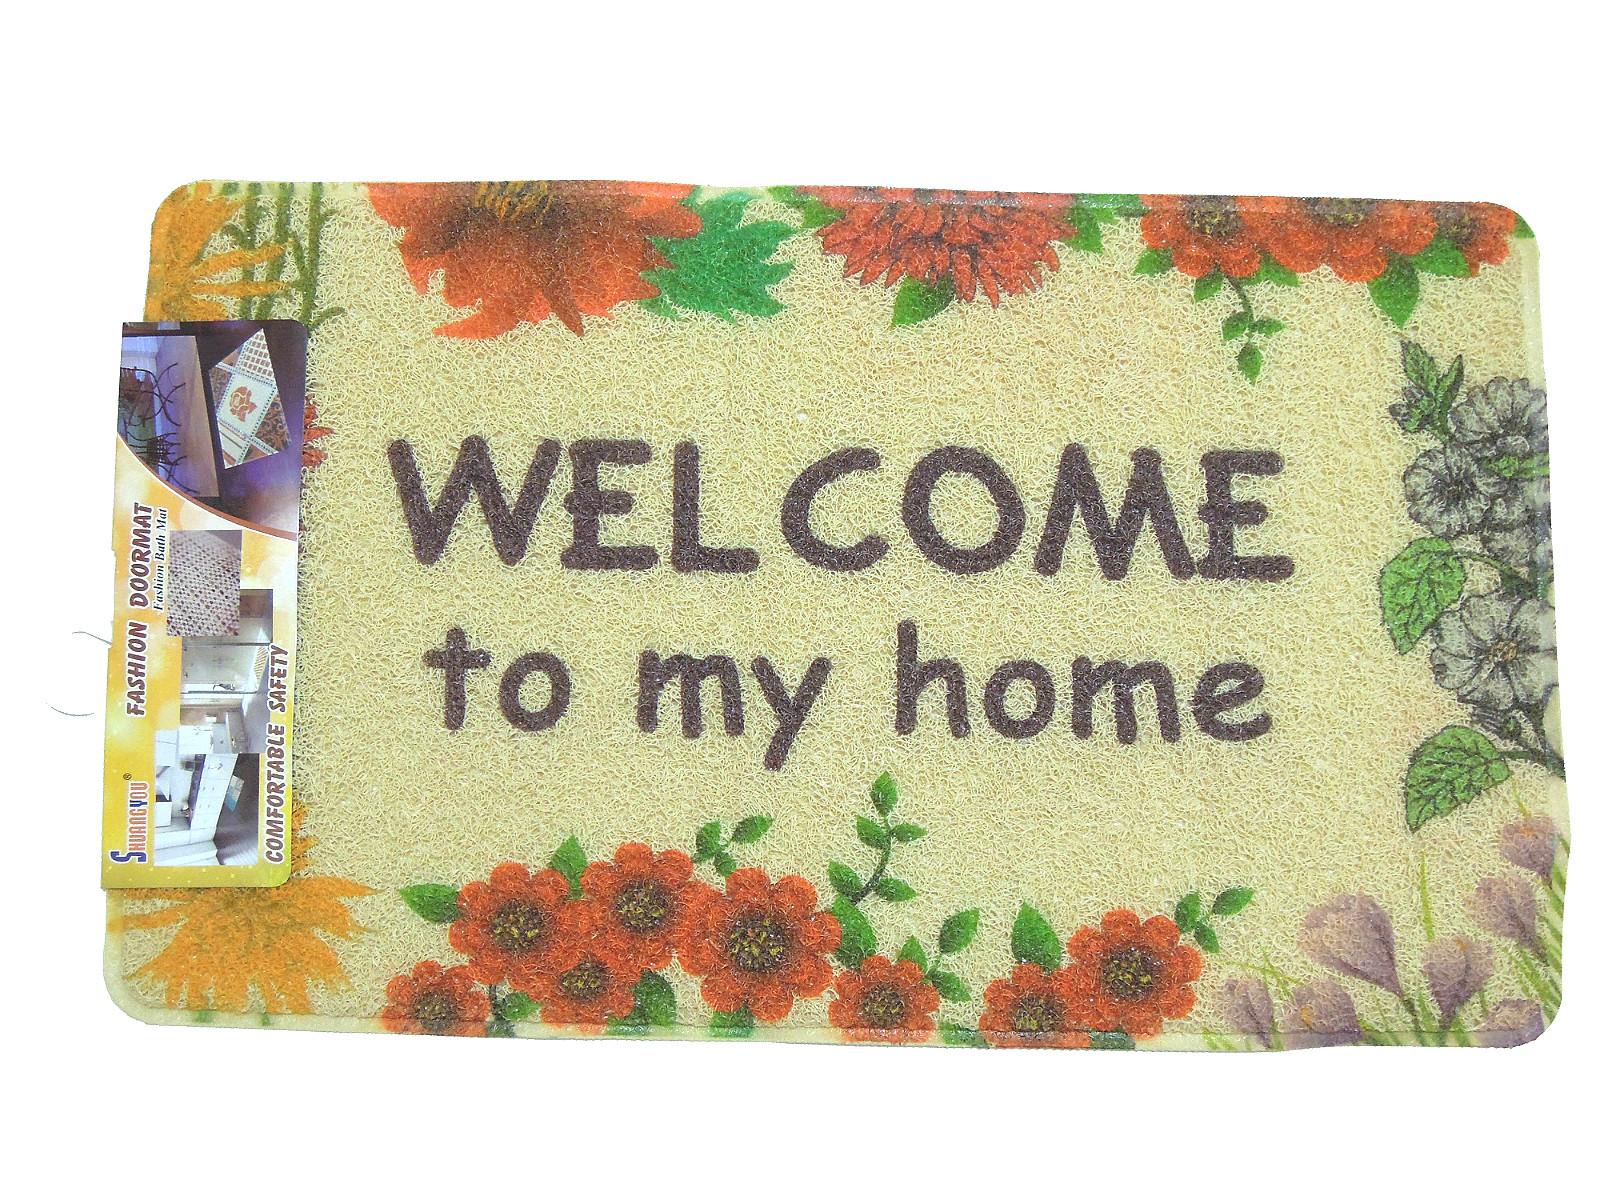 La maison生活小舖《PVC刮泥門墊地墊》滿滿花朵歡迎美觀圖案 獨特纖維表面 耐用防滑 地墊/軟墊/腳踏墊/止滑墊/刮泥墊